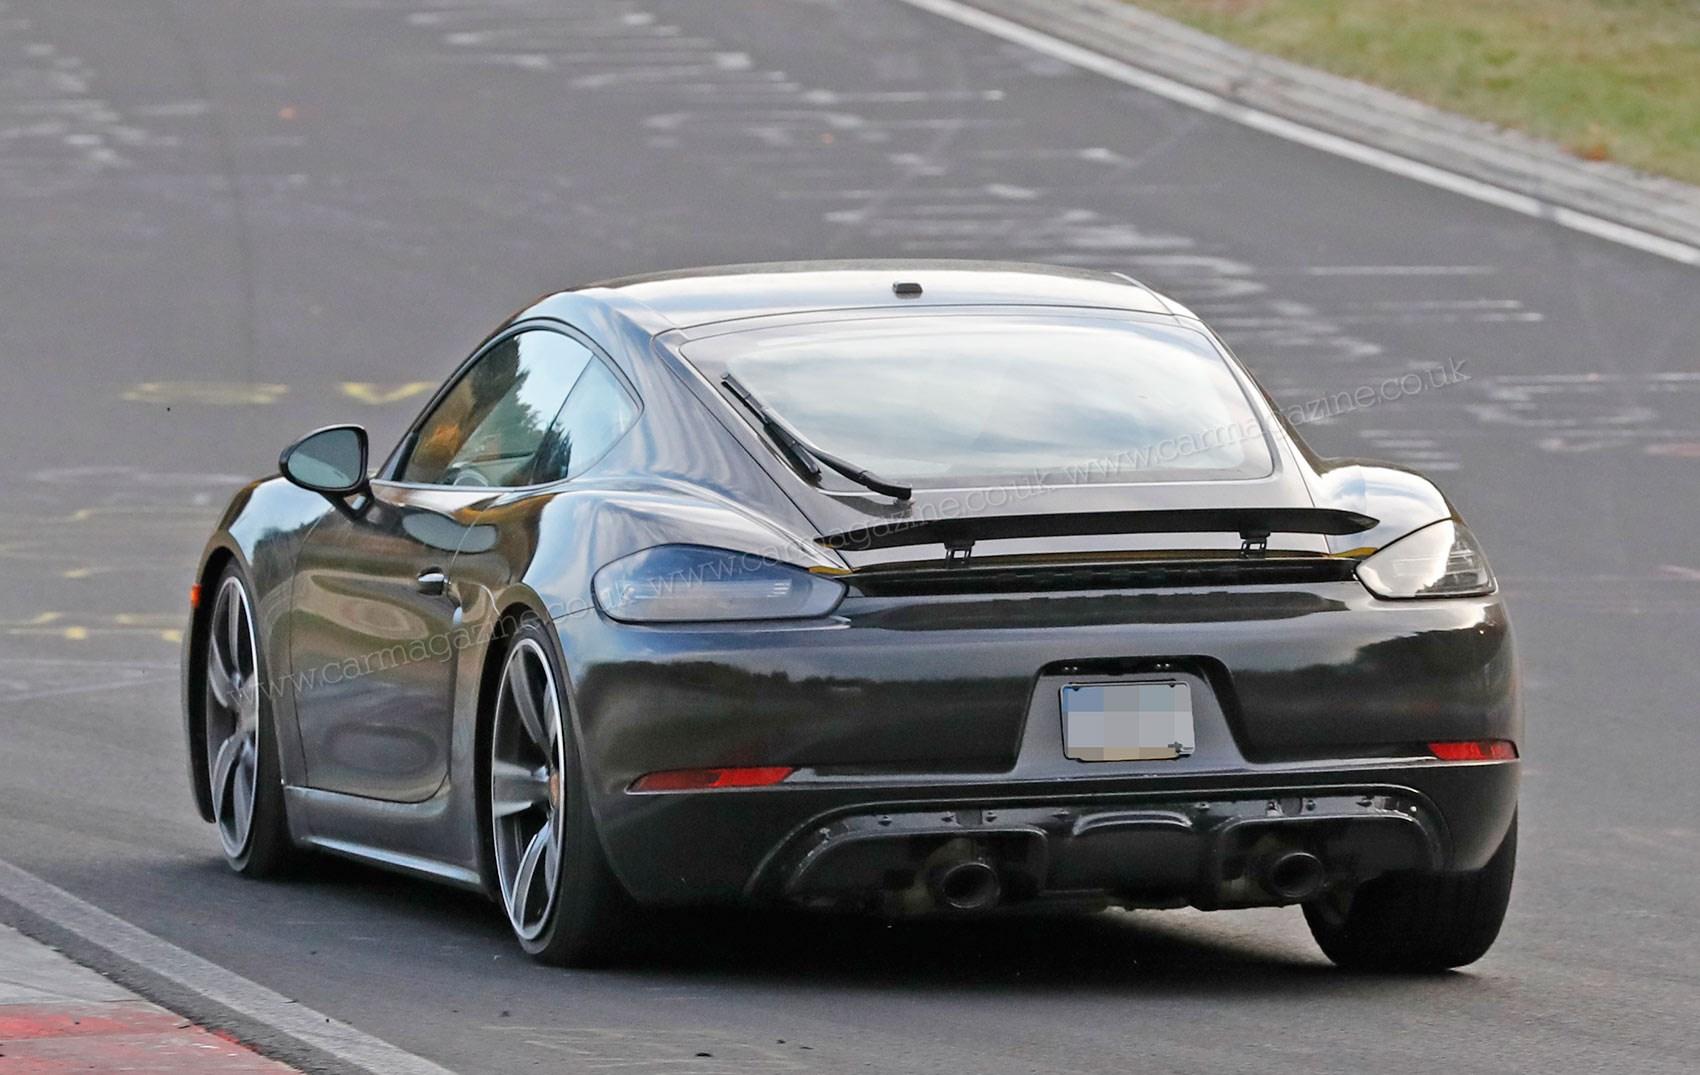 Porsche Boxster - super-managed supercar for minimum money